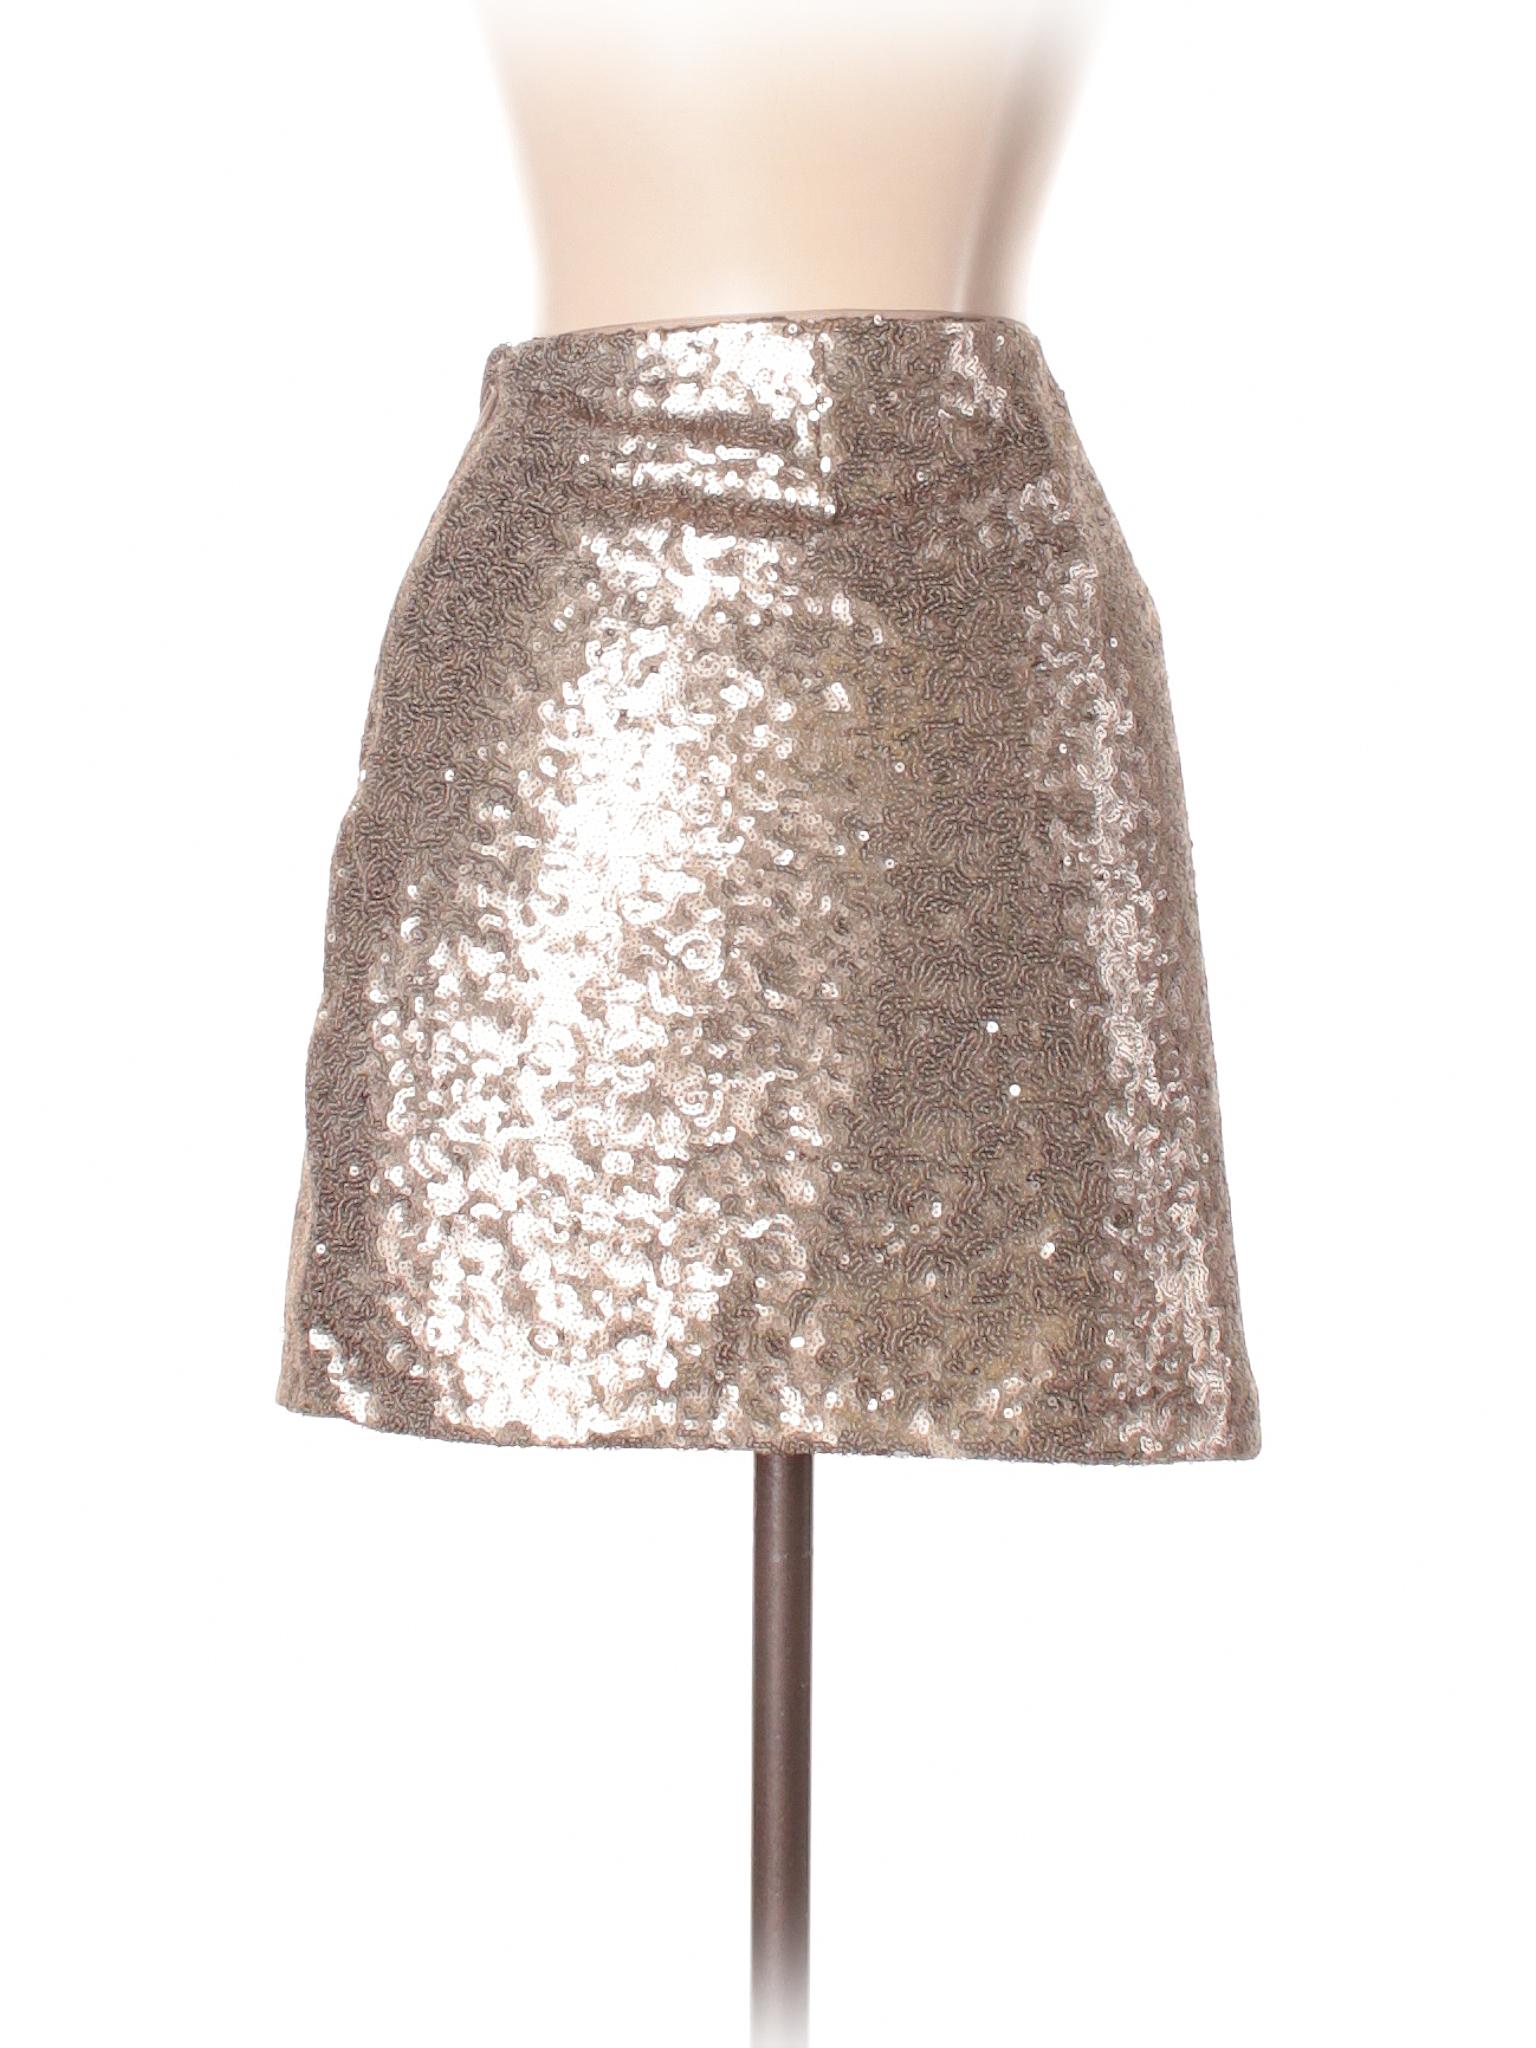 Formal Skirt Formal Skirt Boutique Boutique Formal Boutique 6qEzw4U